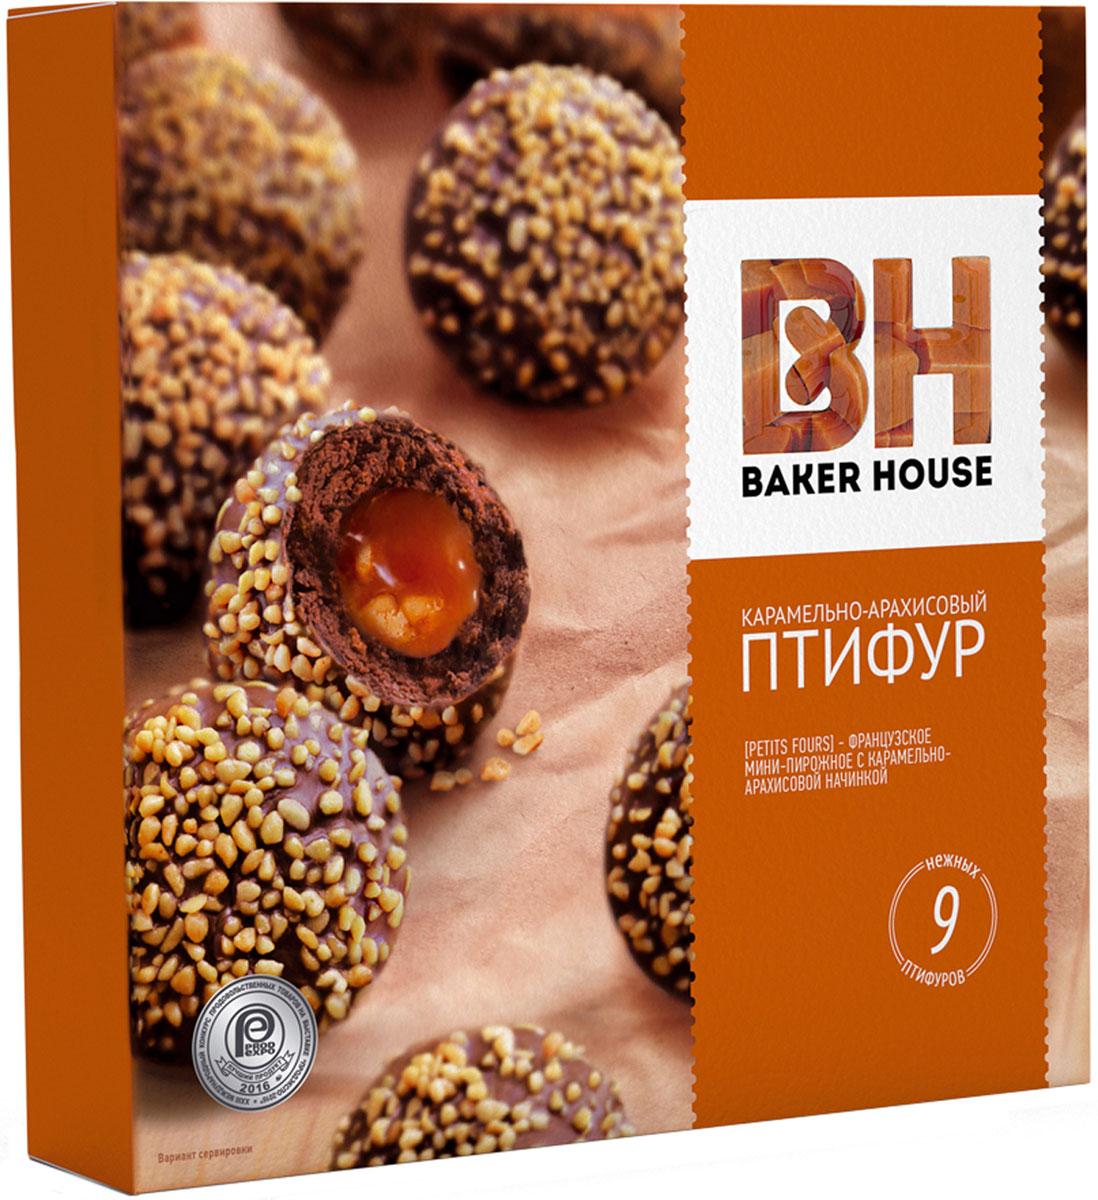 Baker HouseПтифур пирожные карамель с арахисом, 225 г Baker House